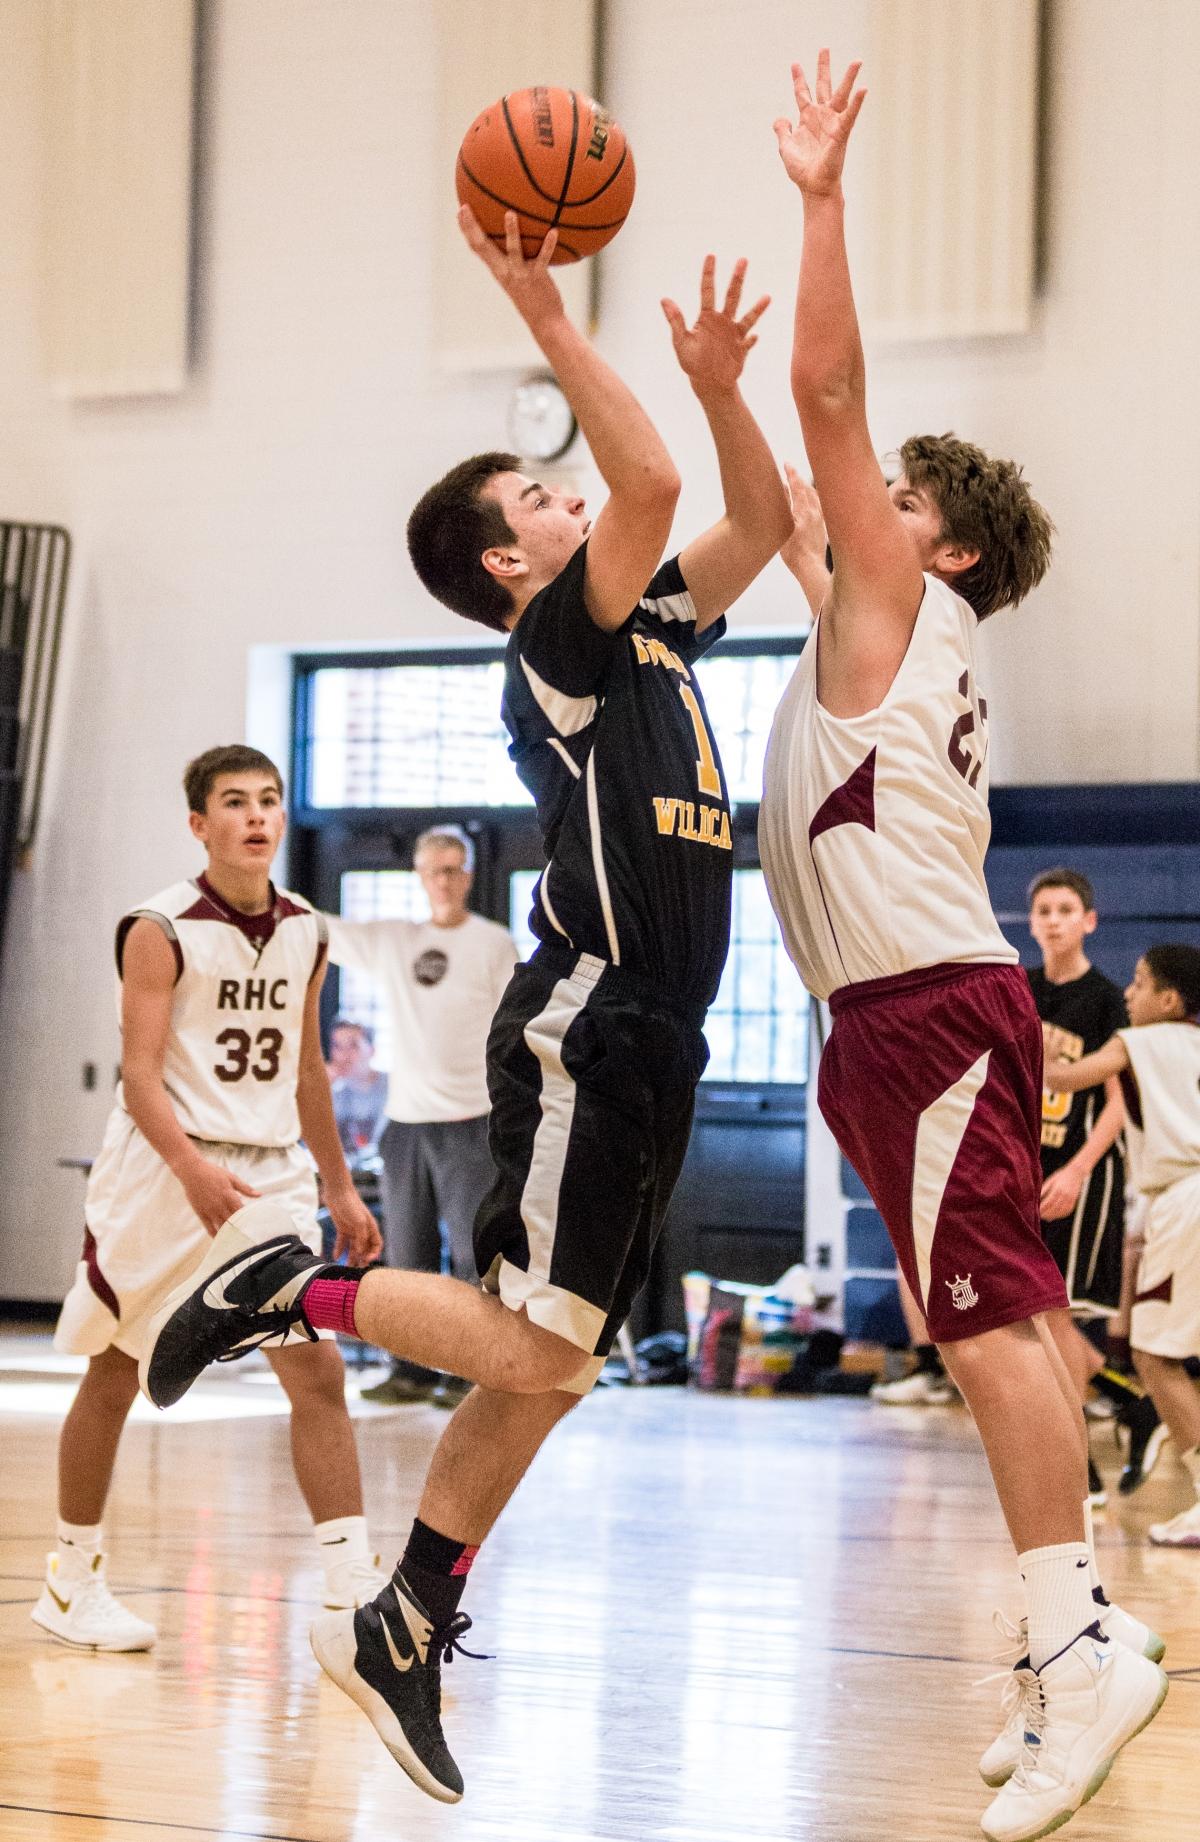 8th Grade Basketball: West Milford @ Ridgewood,NJ